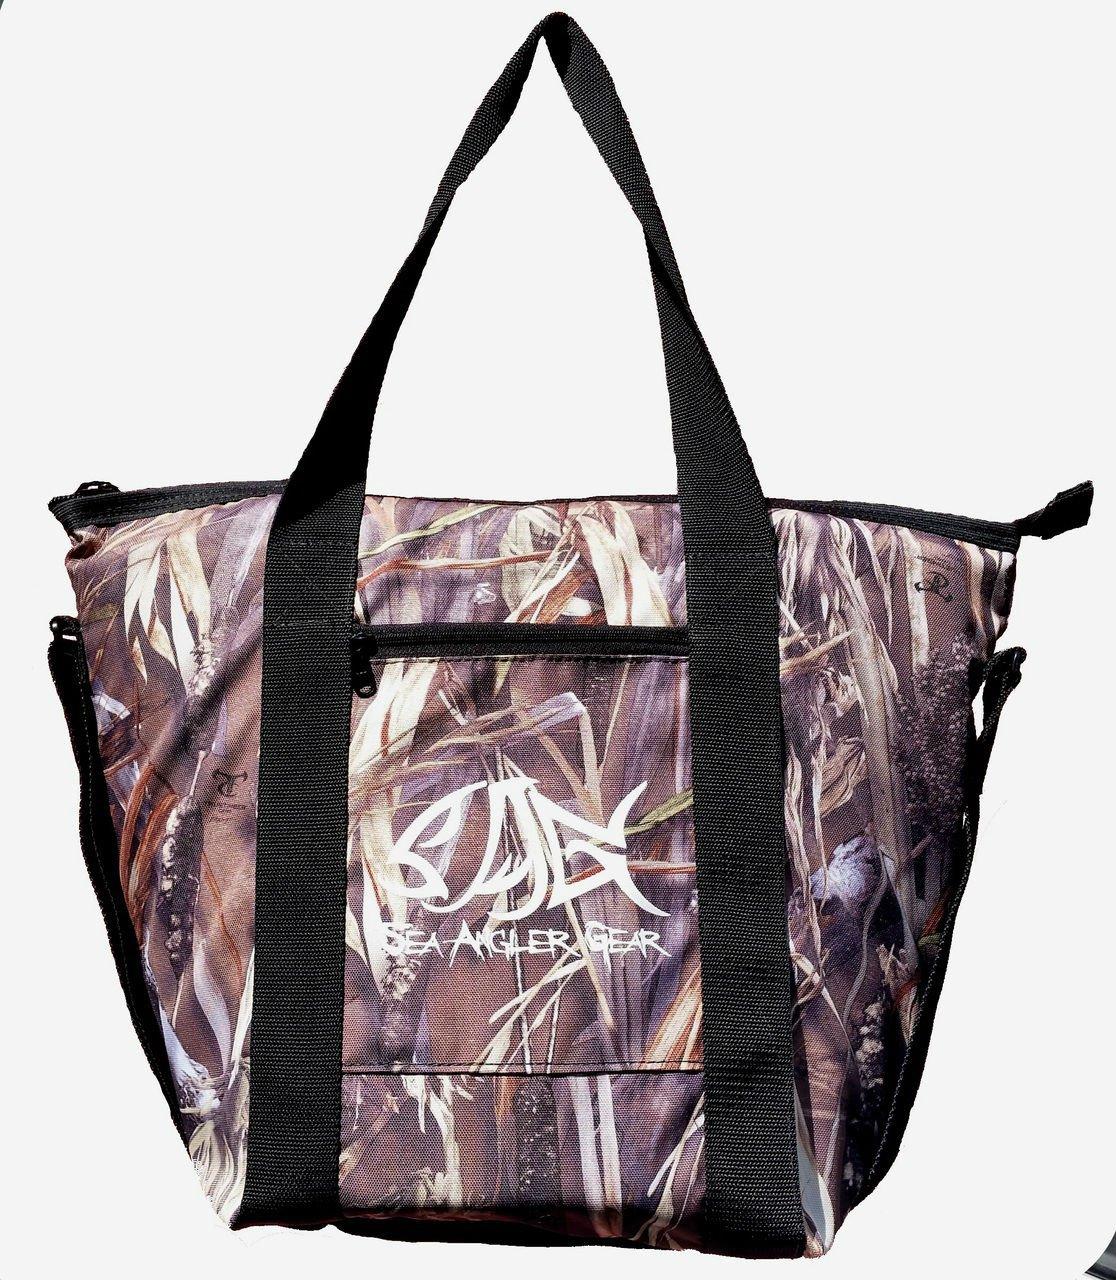 Sea Angler Gear True Timber Camo Insulated Soft Cooler Bag by Sea Angler Gear